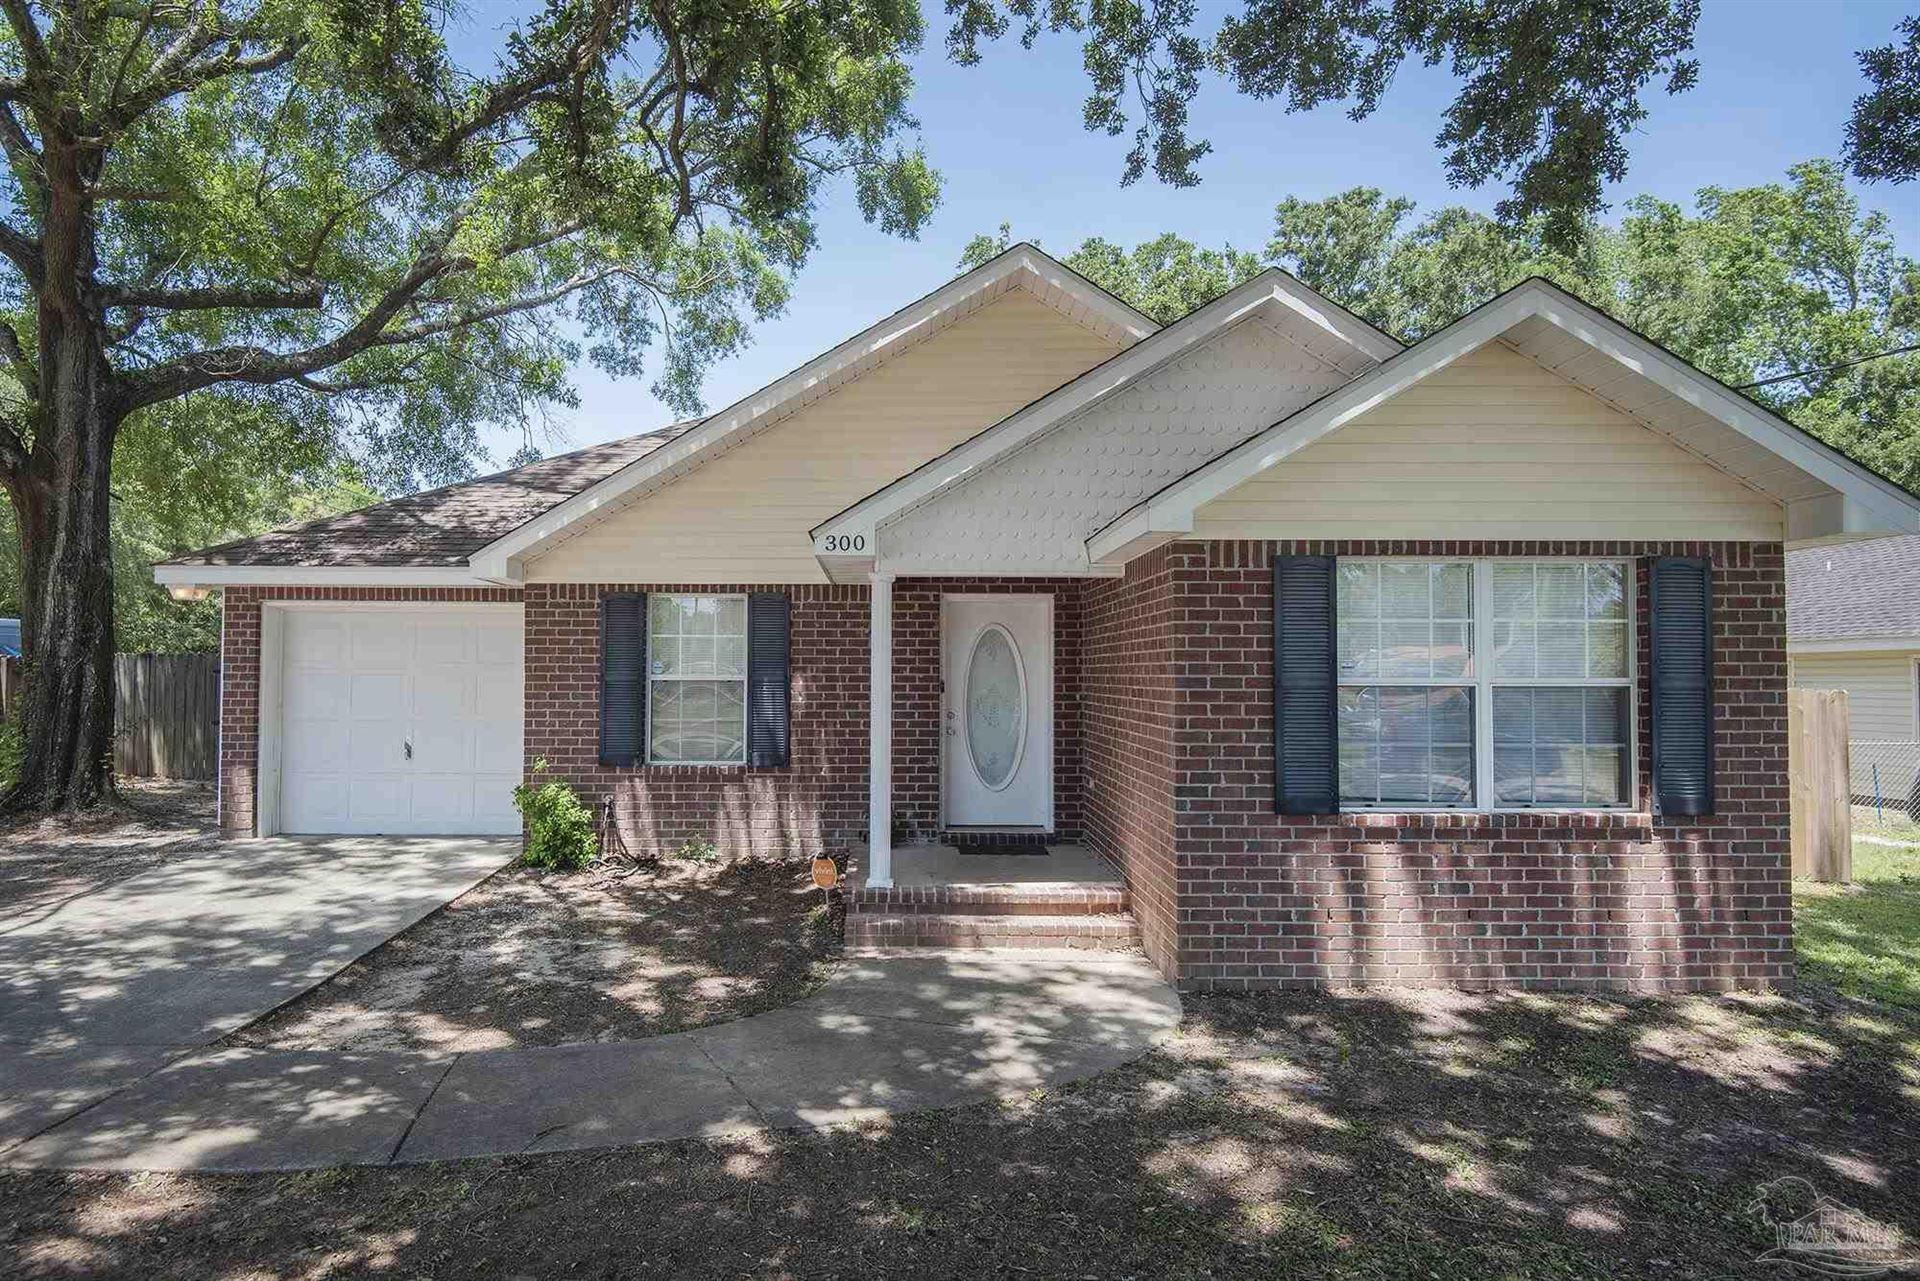 300 ROBINSON LN, Pensacola, FL 32514 - MLS#: 590193